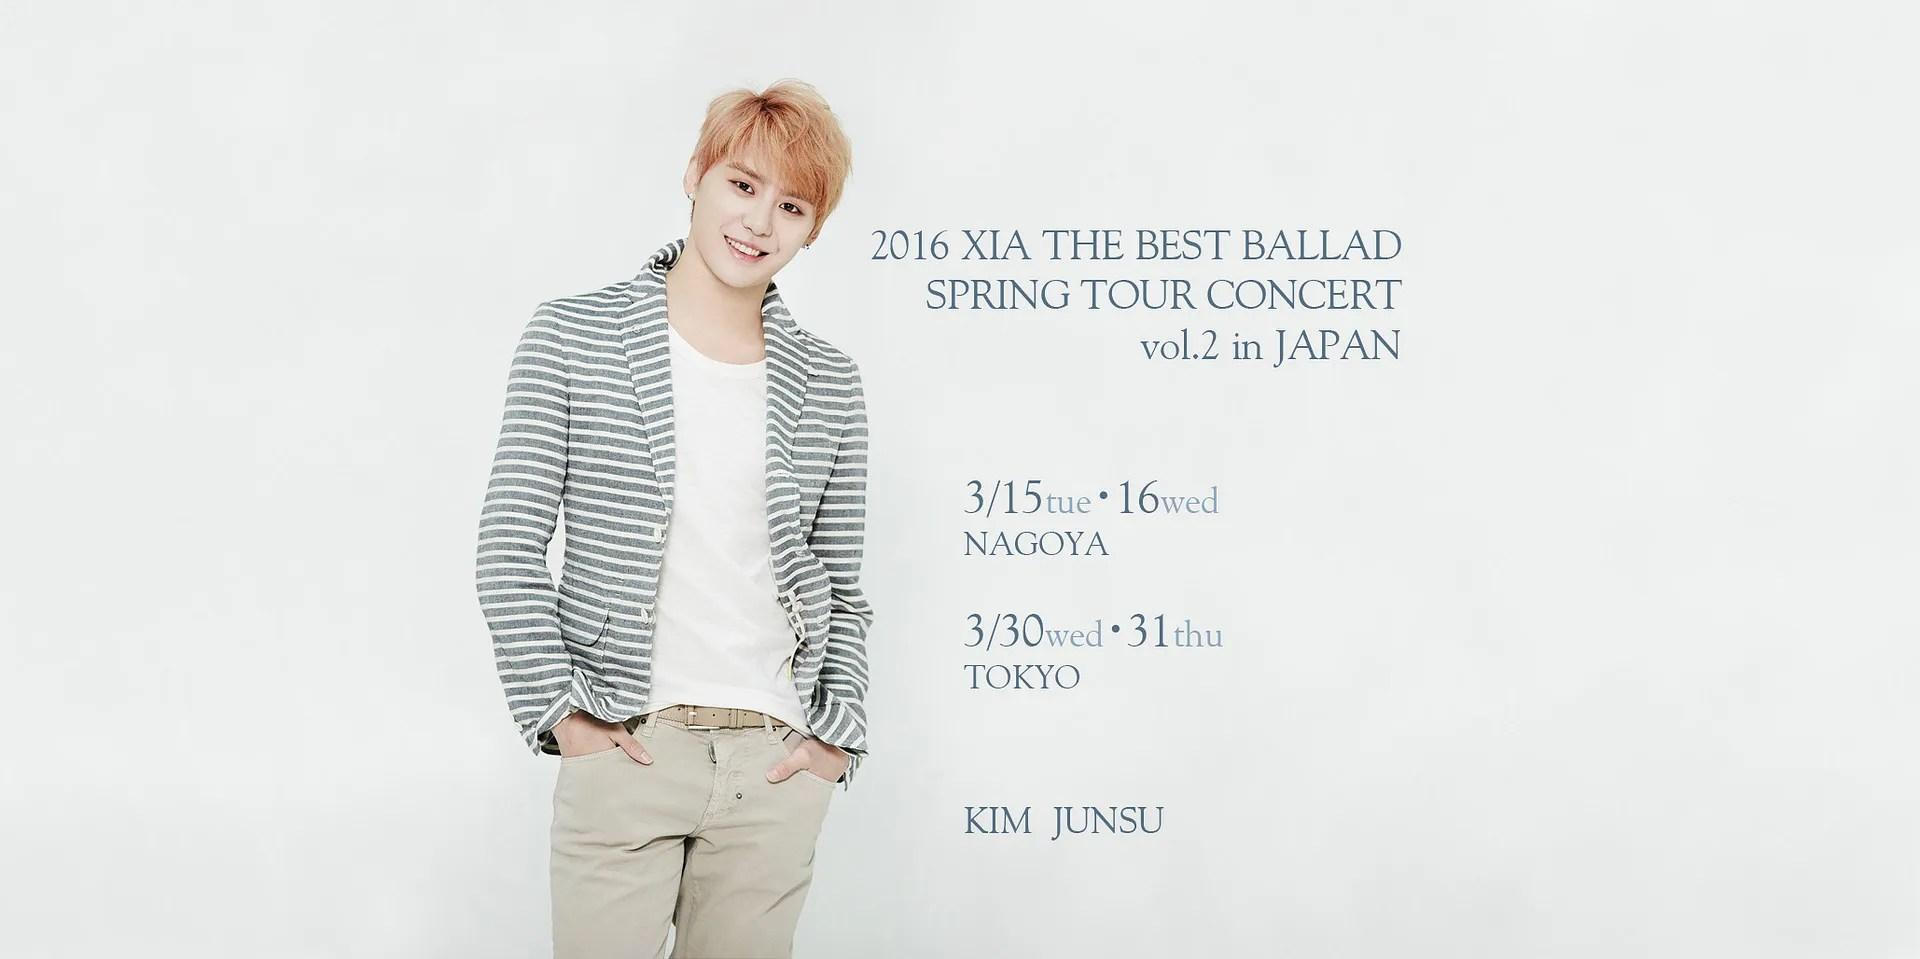 photo junsu-live-main-2016-ballad-spring-tour.jpg